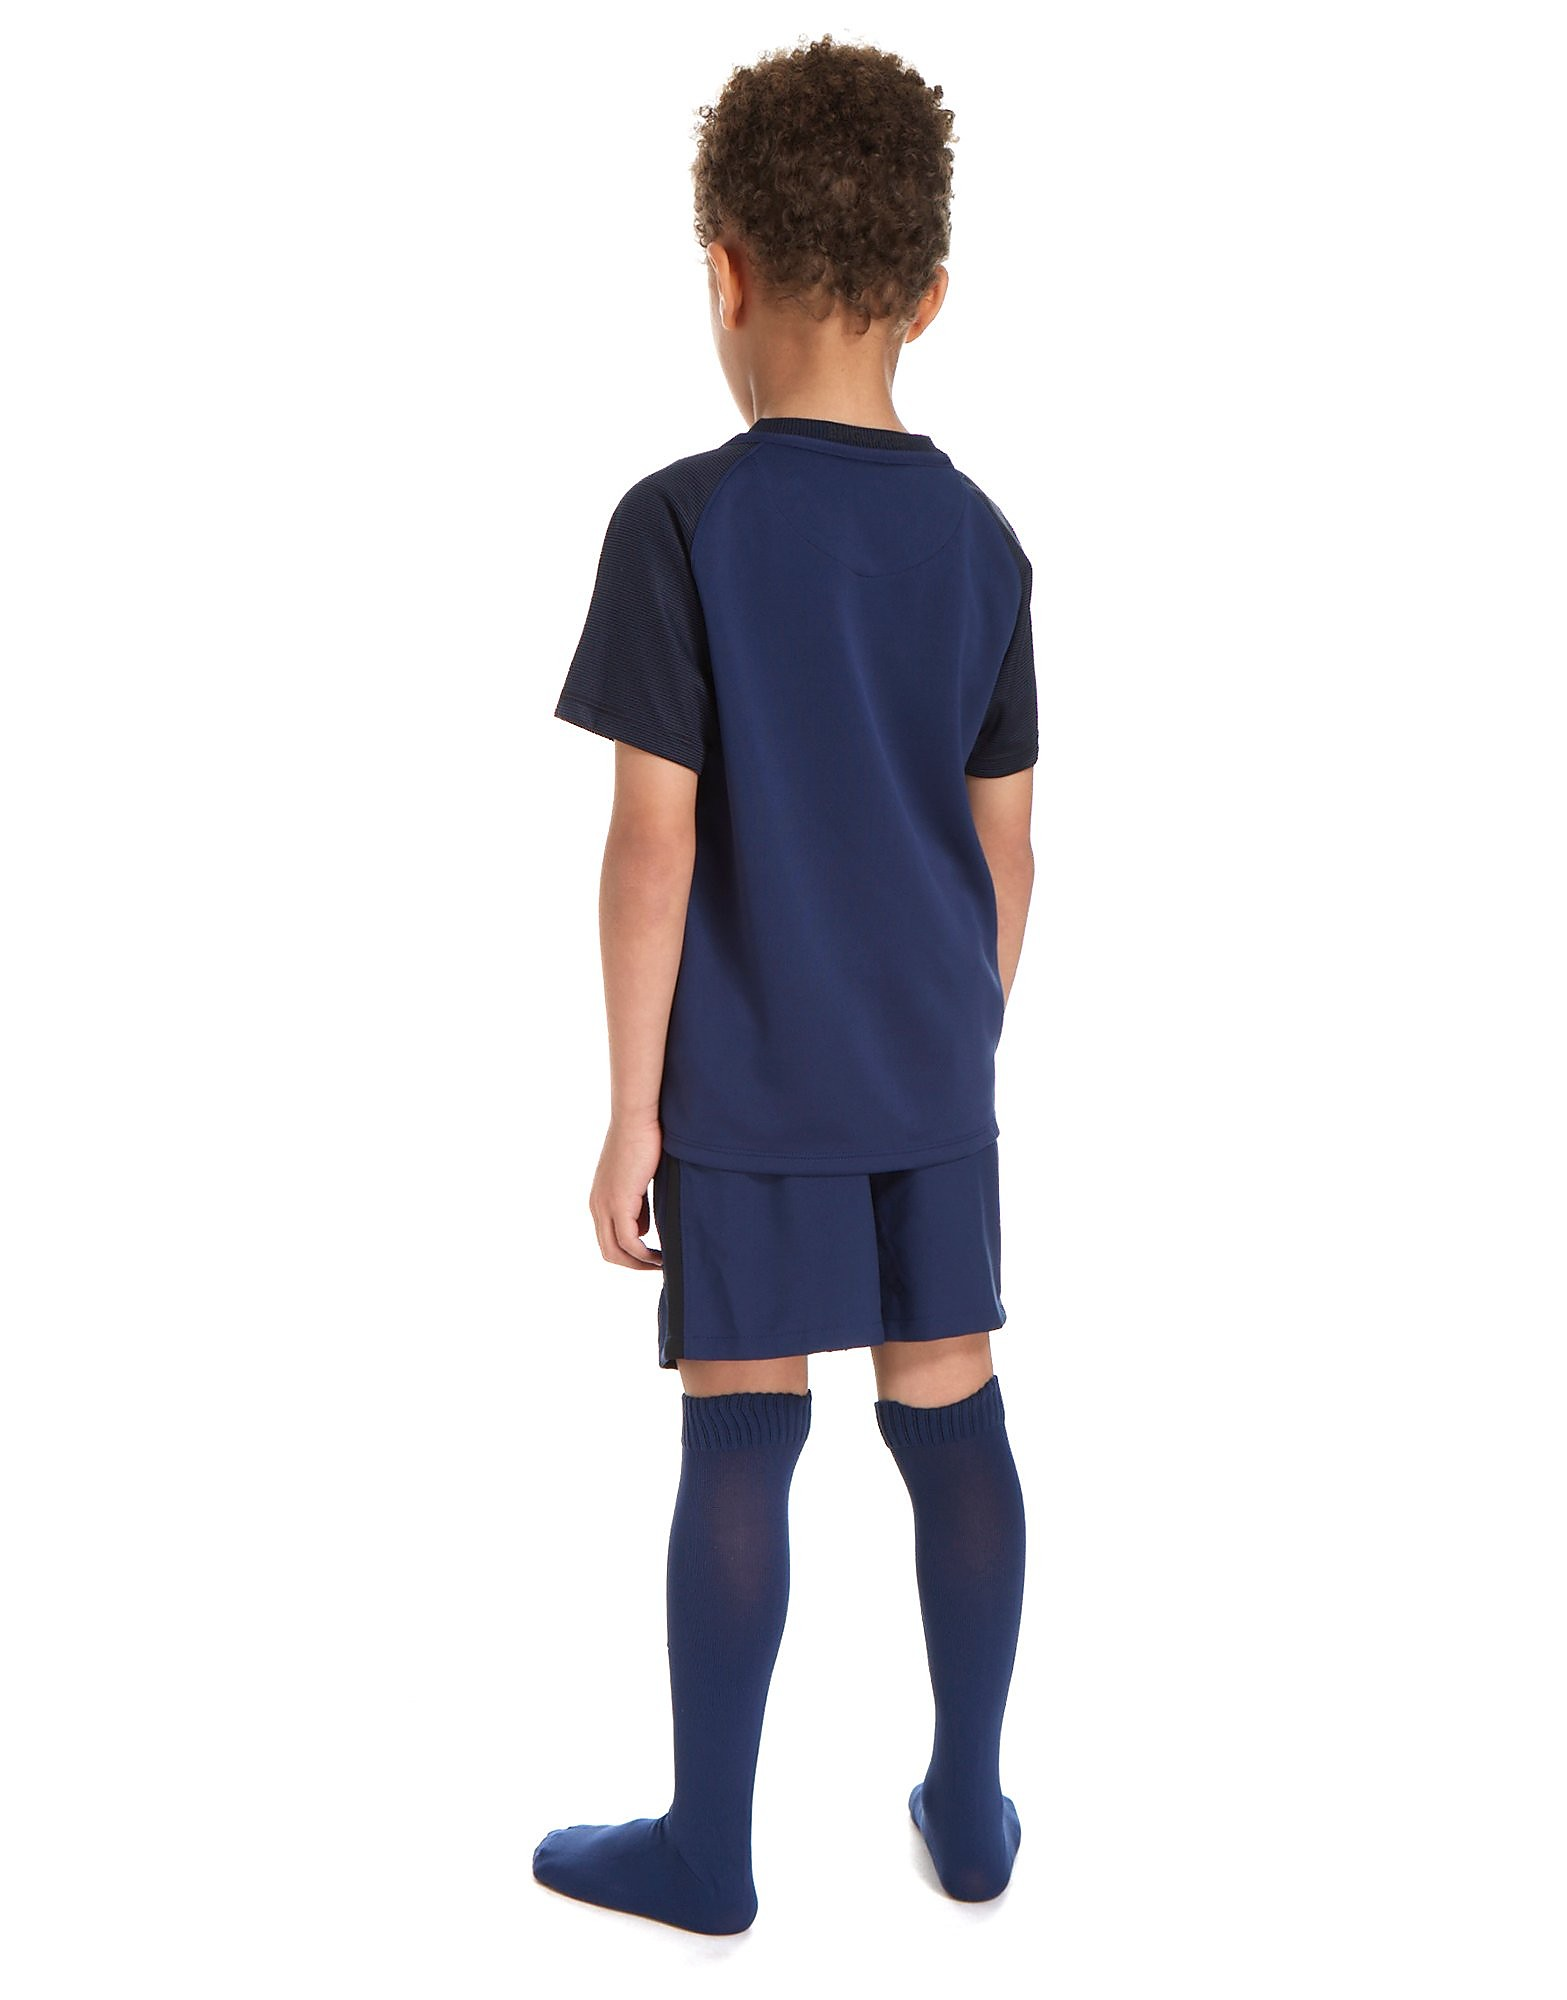 Nike England 2017 Away Kit Children